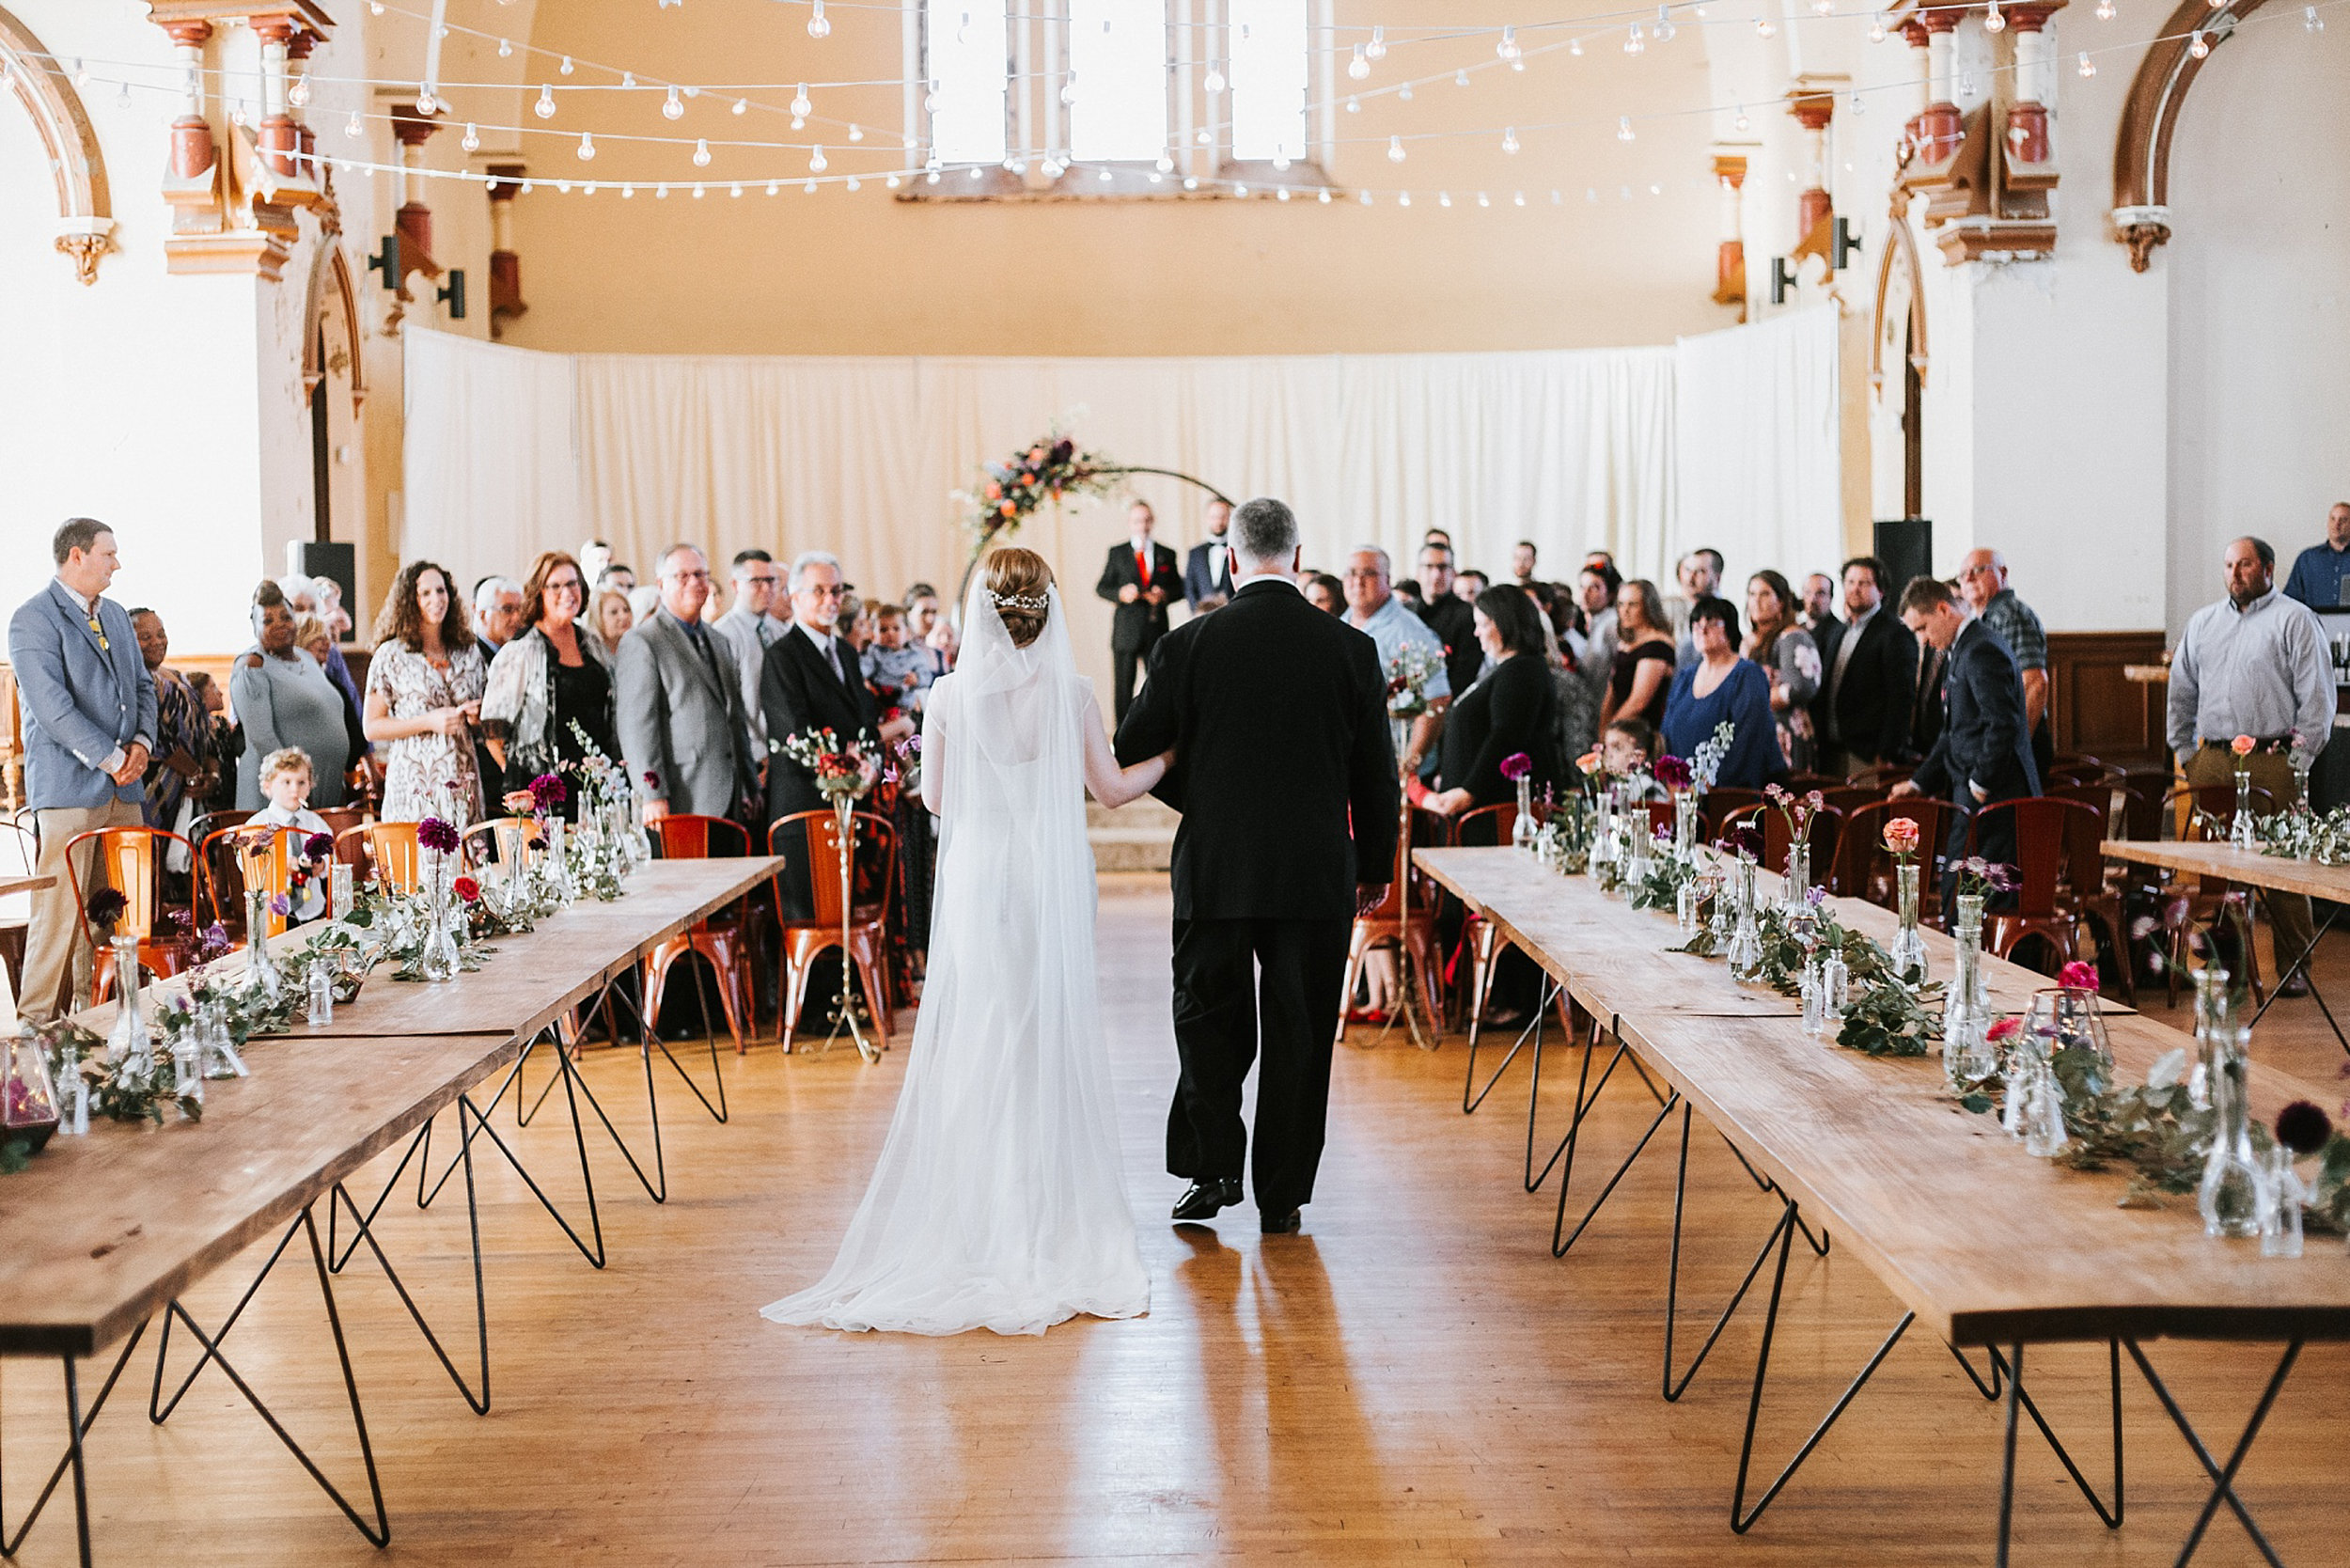 Brooke Townsend Photography - Ohio Wedding Photographer-118.jpg